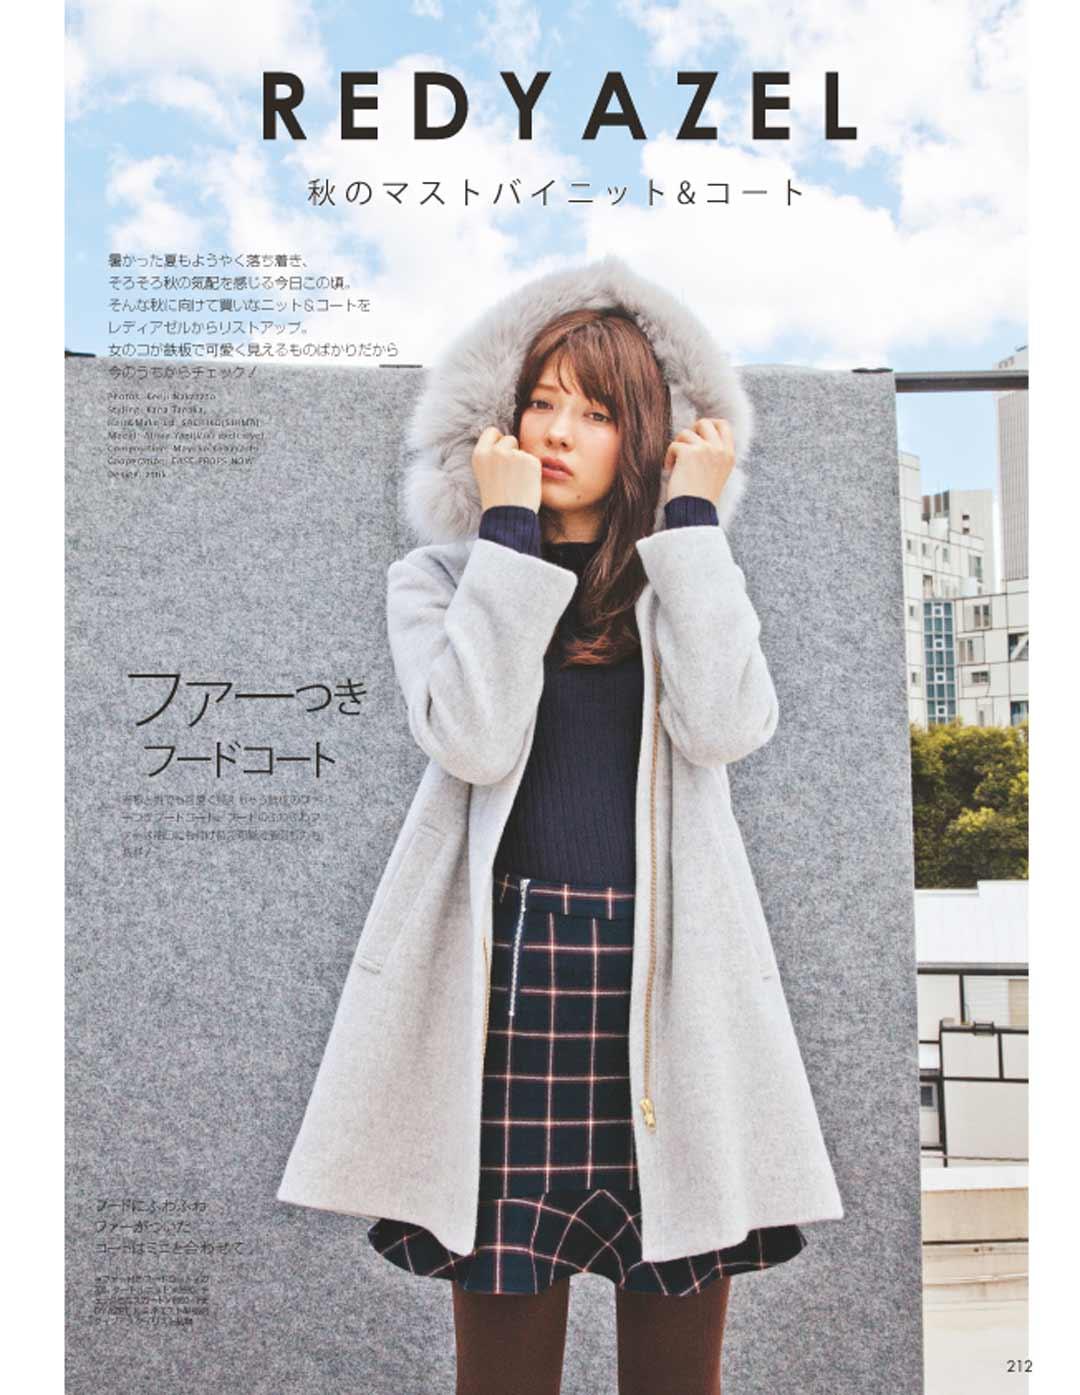 ViVi 11月号P.212『REDYAZEL[レディアゼル]【秋のマストバイニット&コート】』掲載